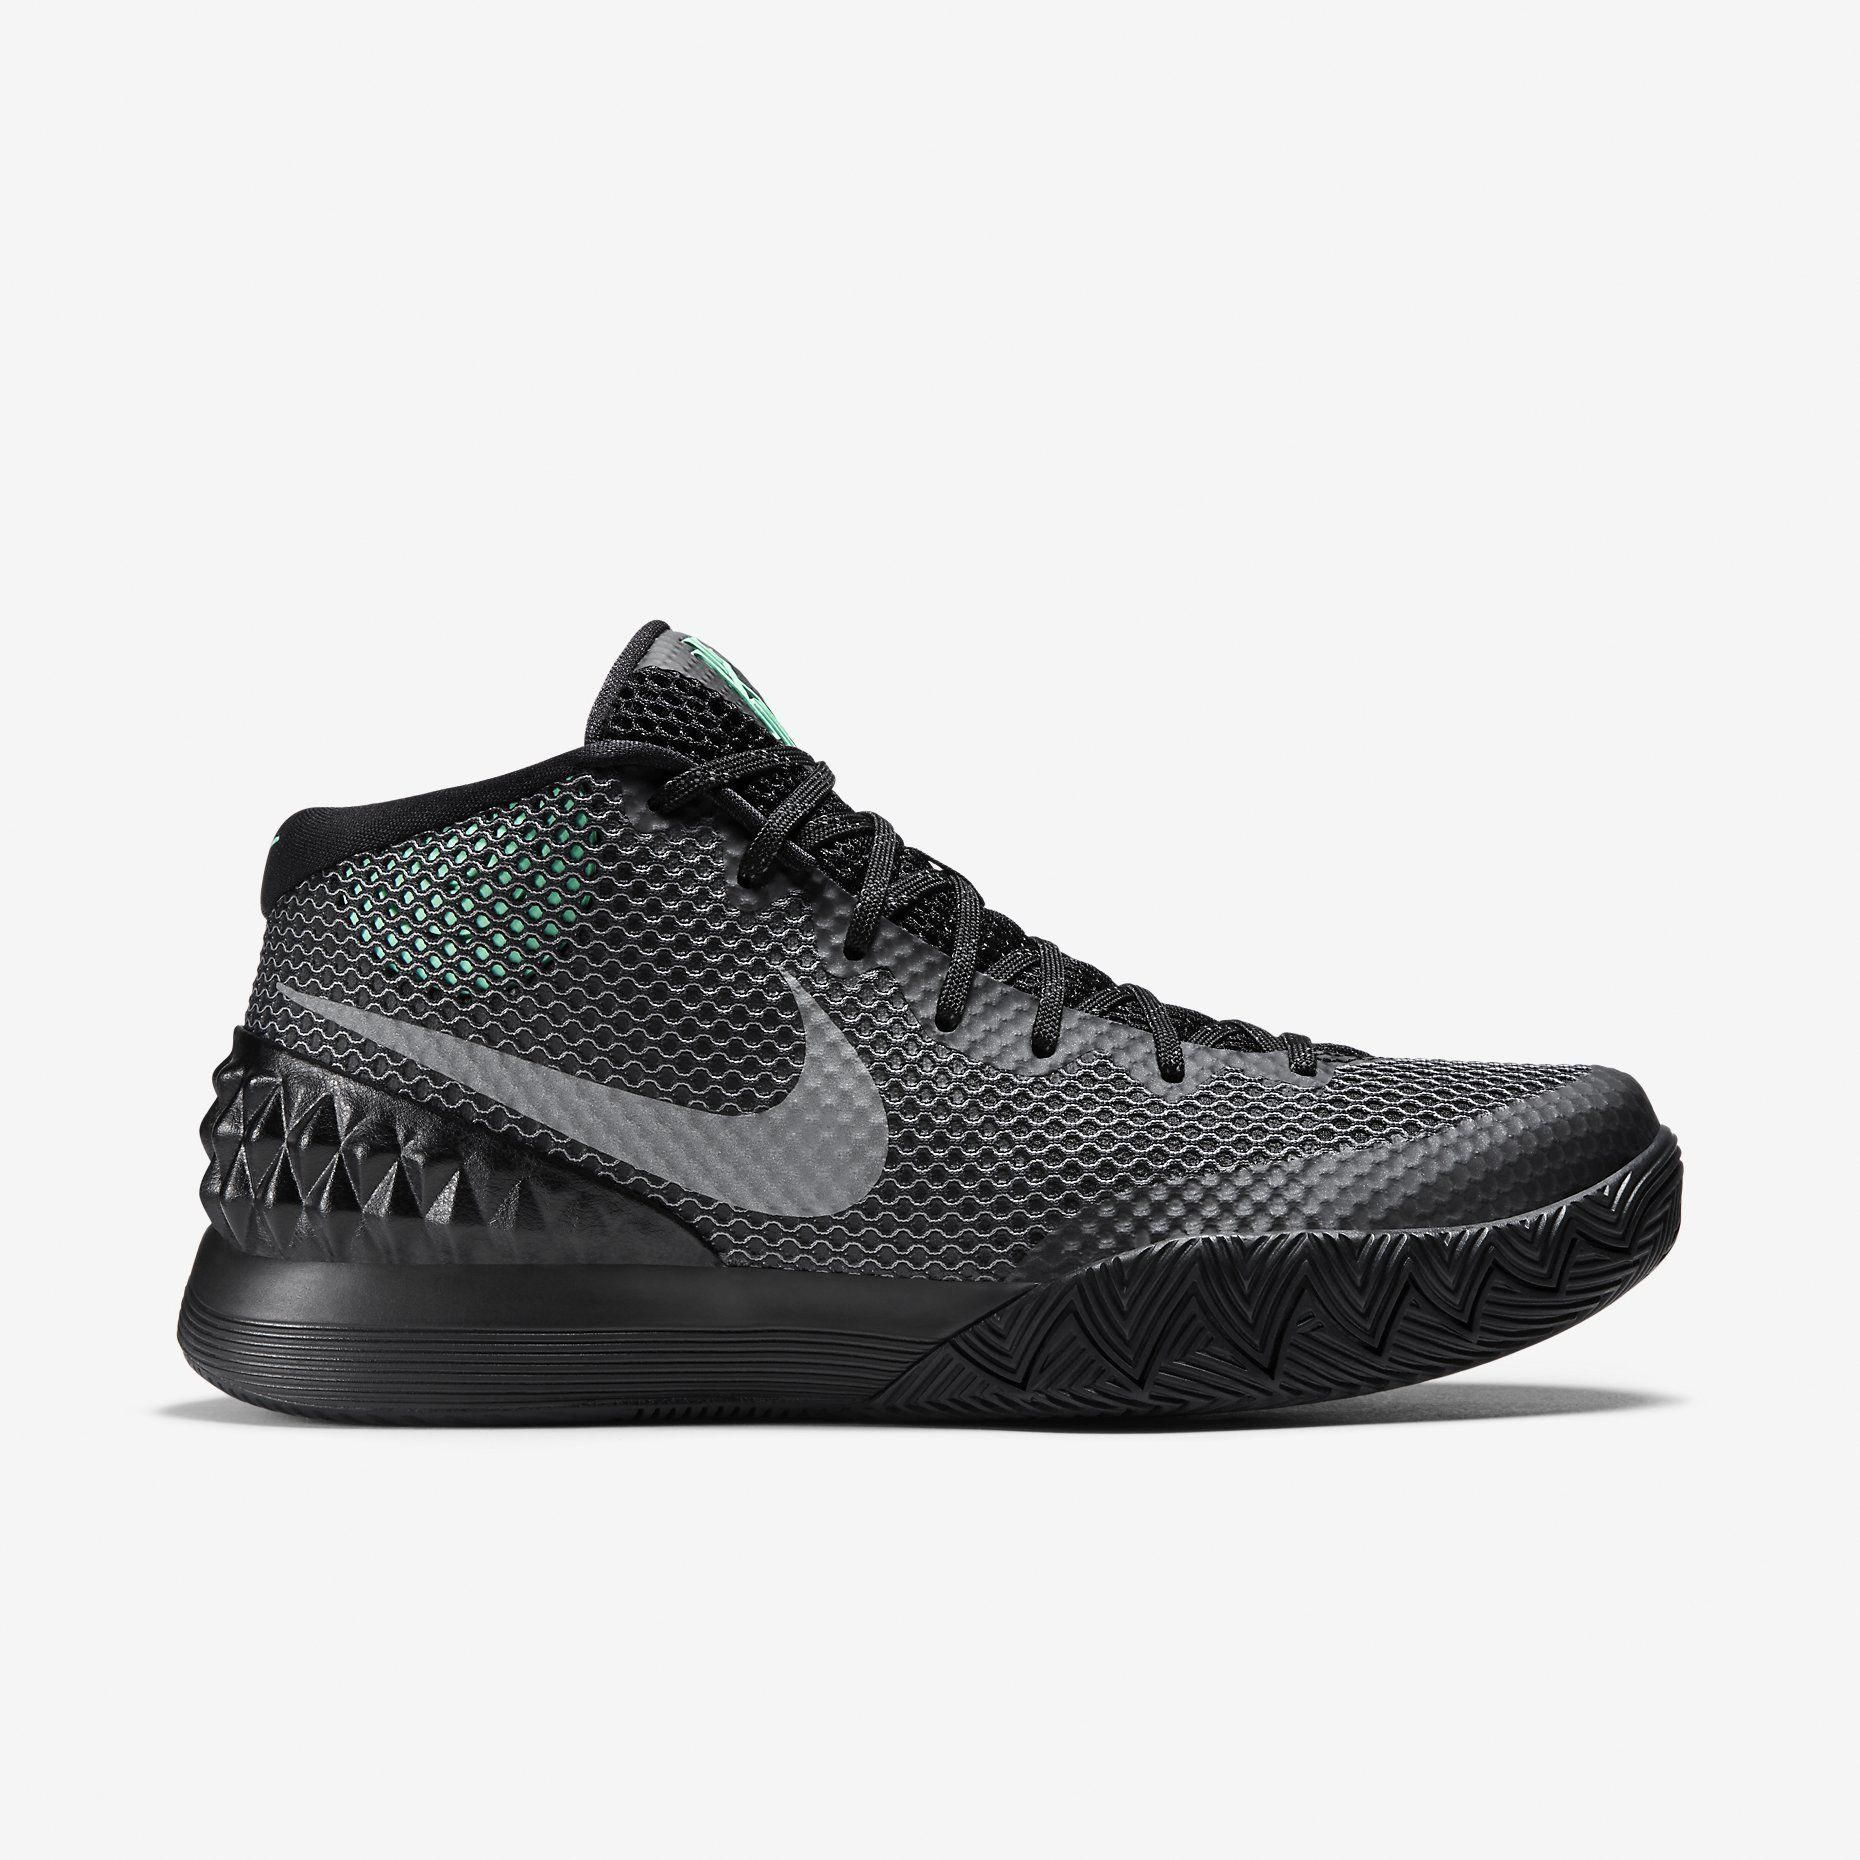 Kyrie 1 Men s Basketball Shoe. Nike Store UK  basketballequipment ... f92fd492a